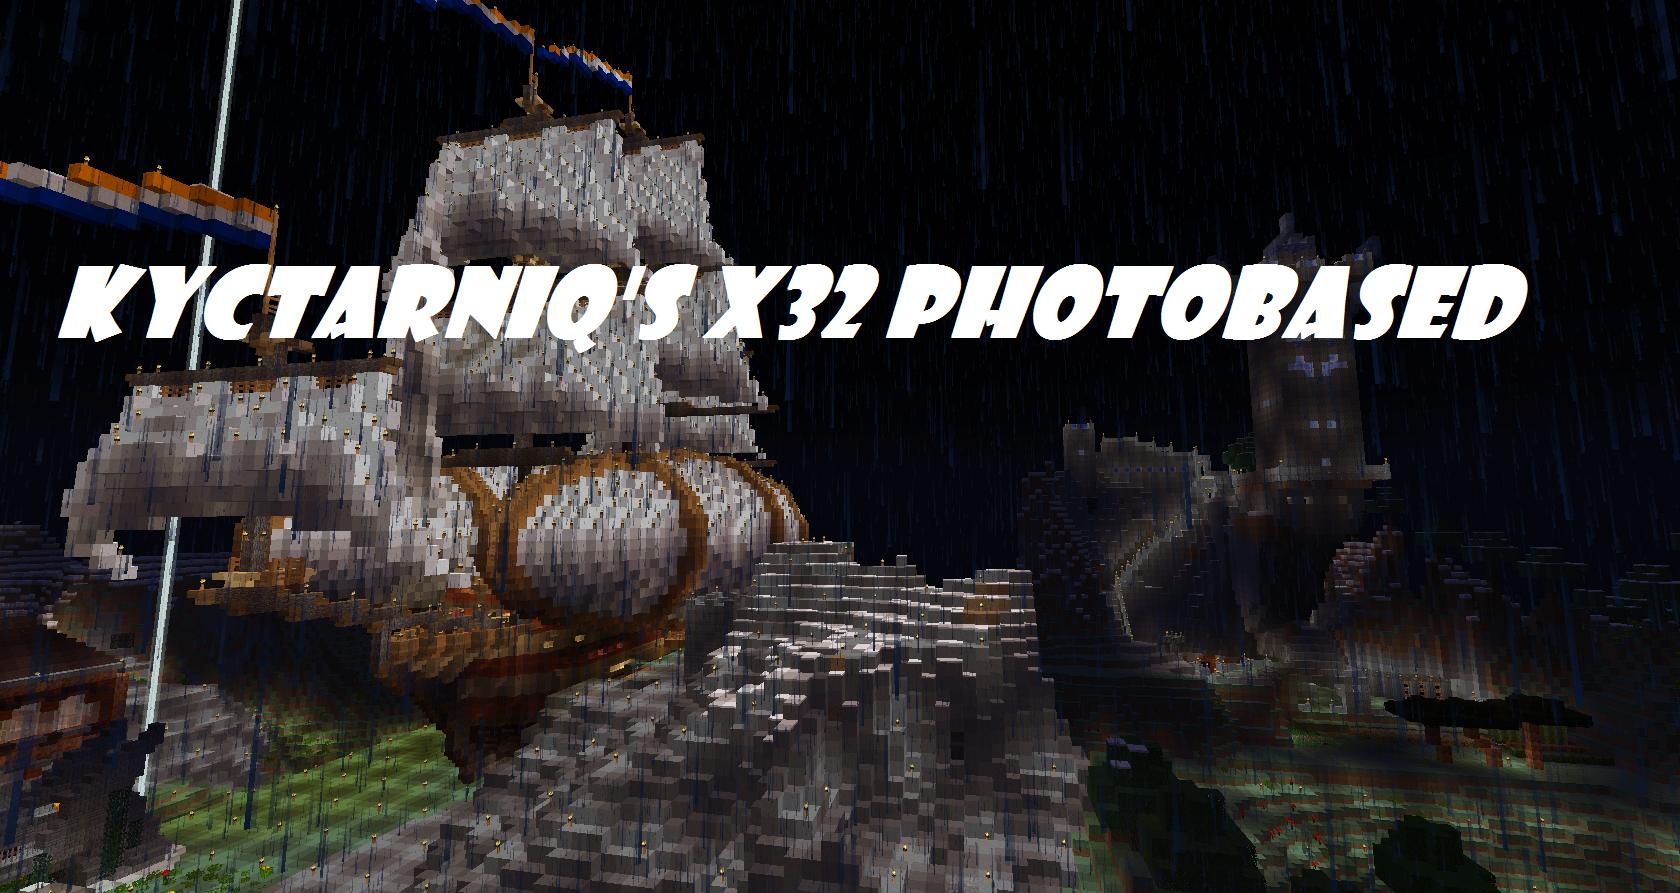 Kyctarniq's x32 Photobased скриншот 1